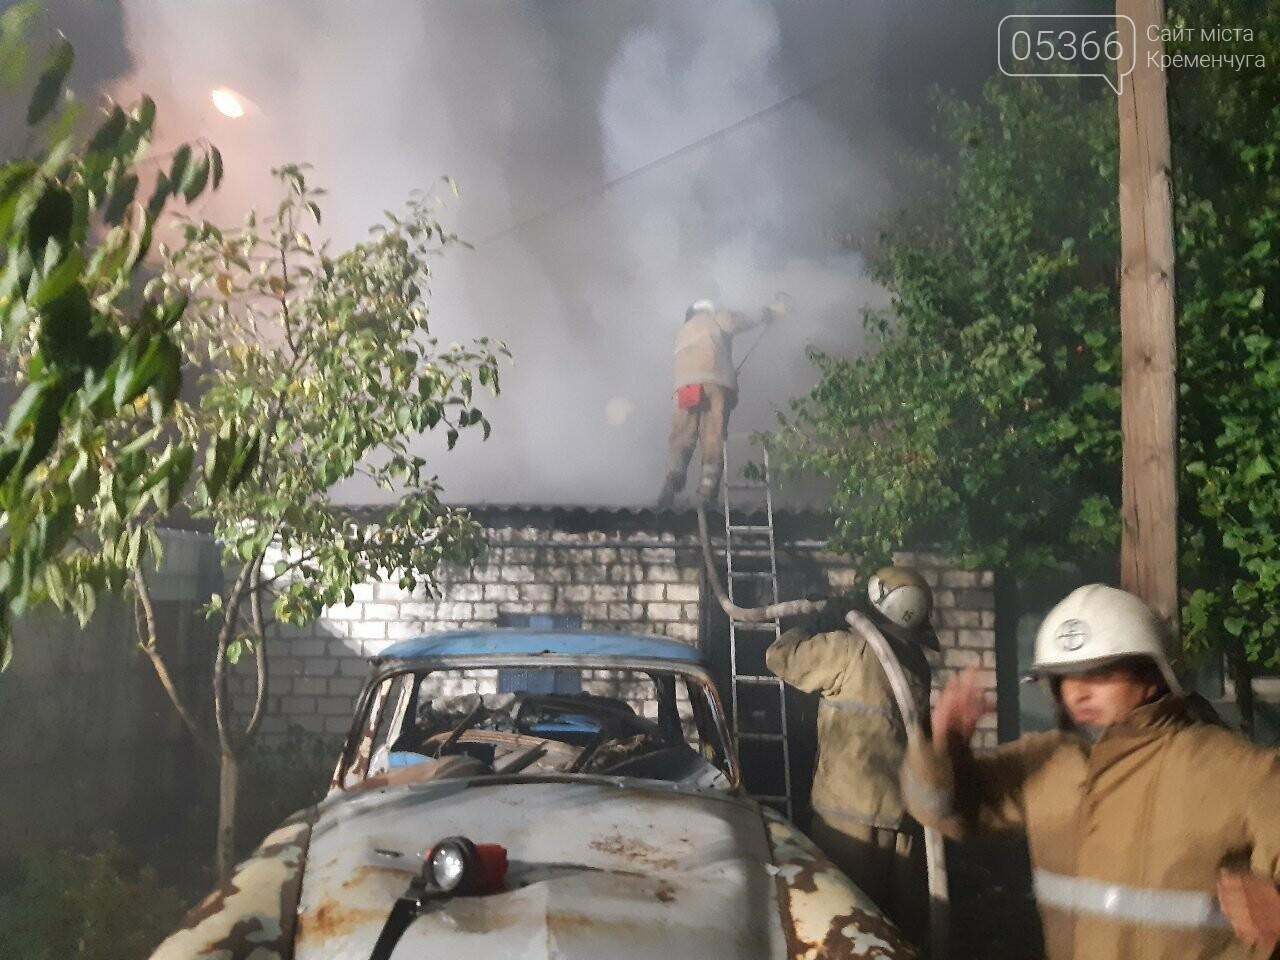 Кременчуцькі пожежники три години гасили вогонь у житловому будинку, фото-2